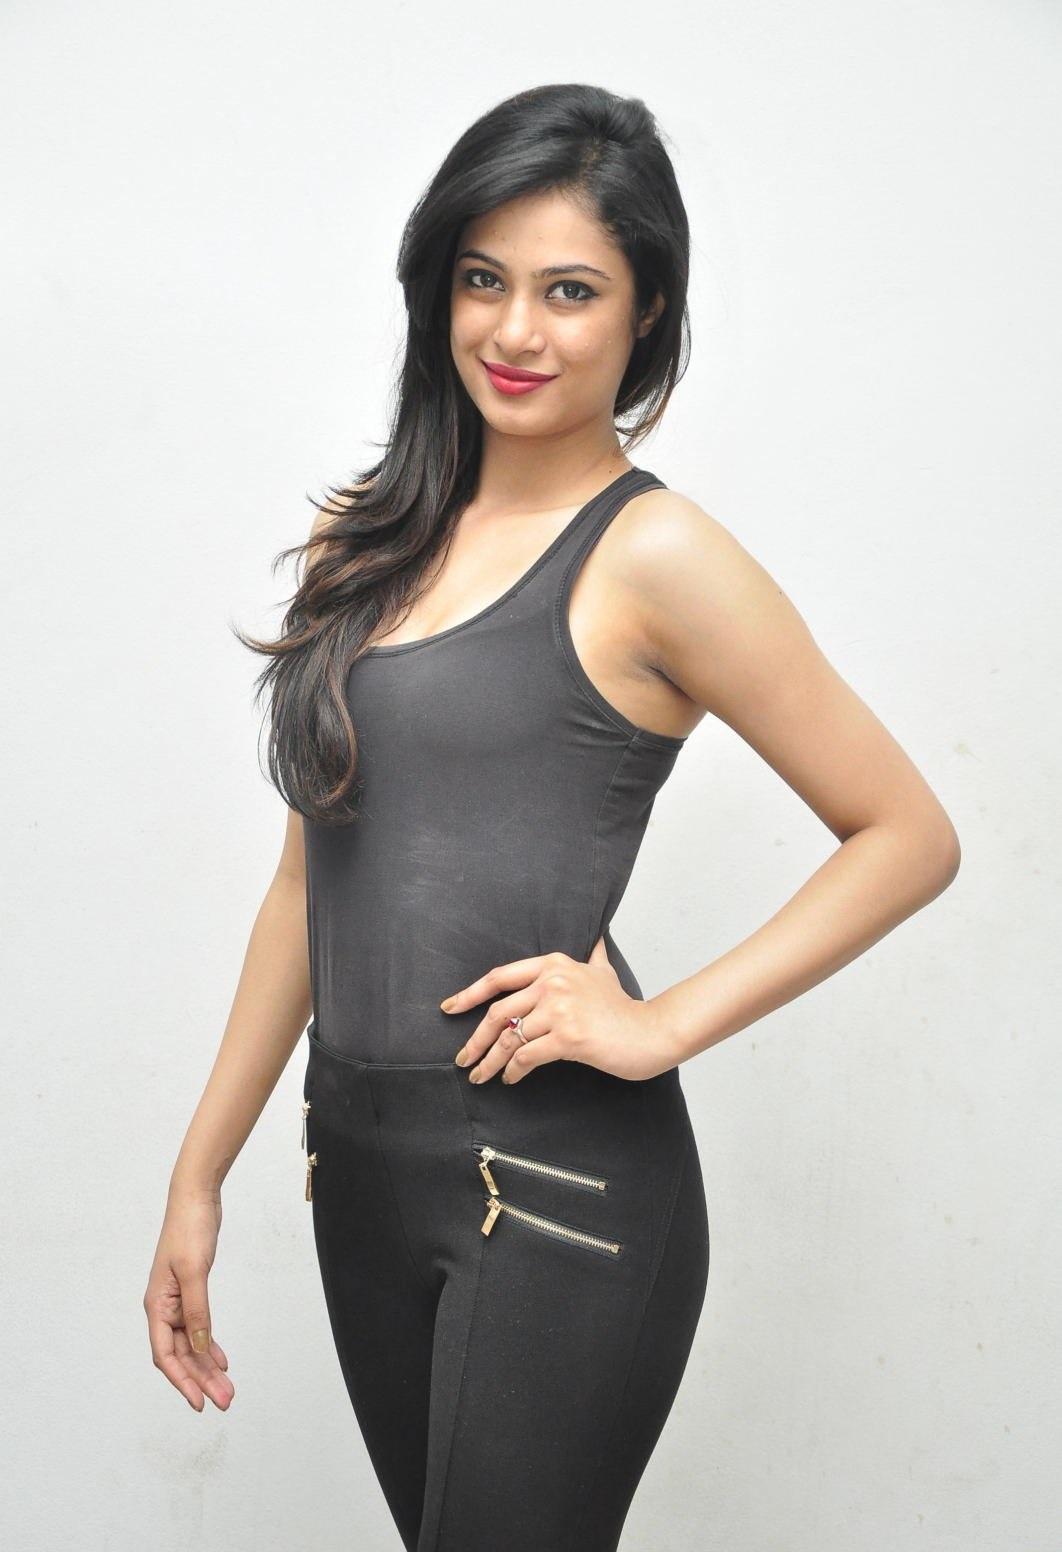 Zara Shah hot in swimsuit